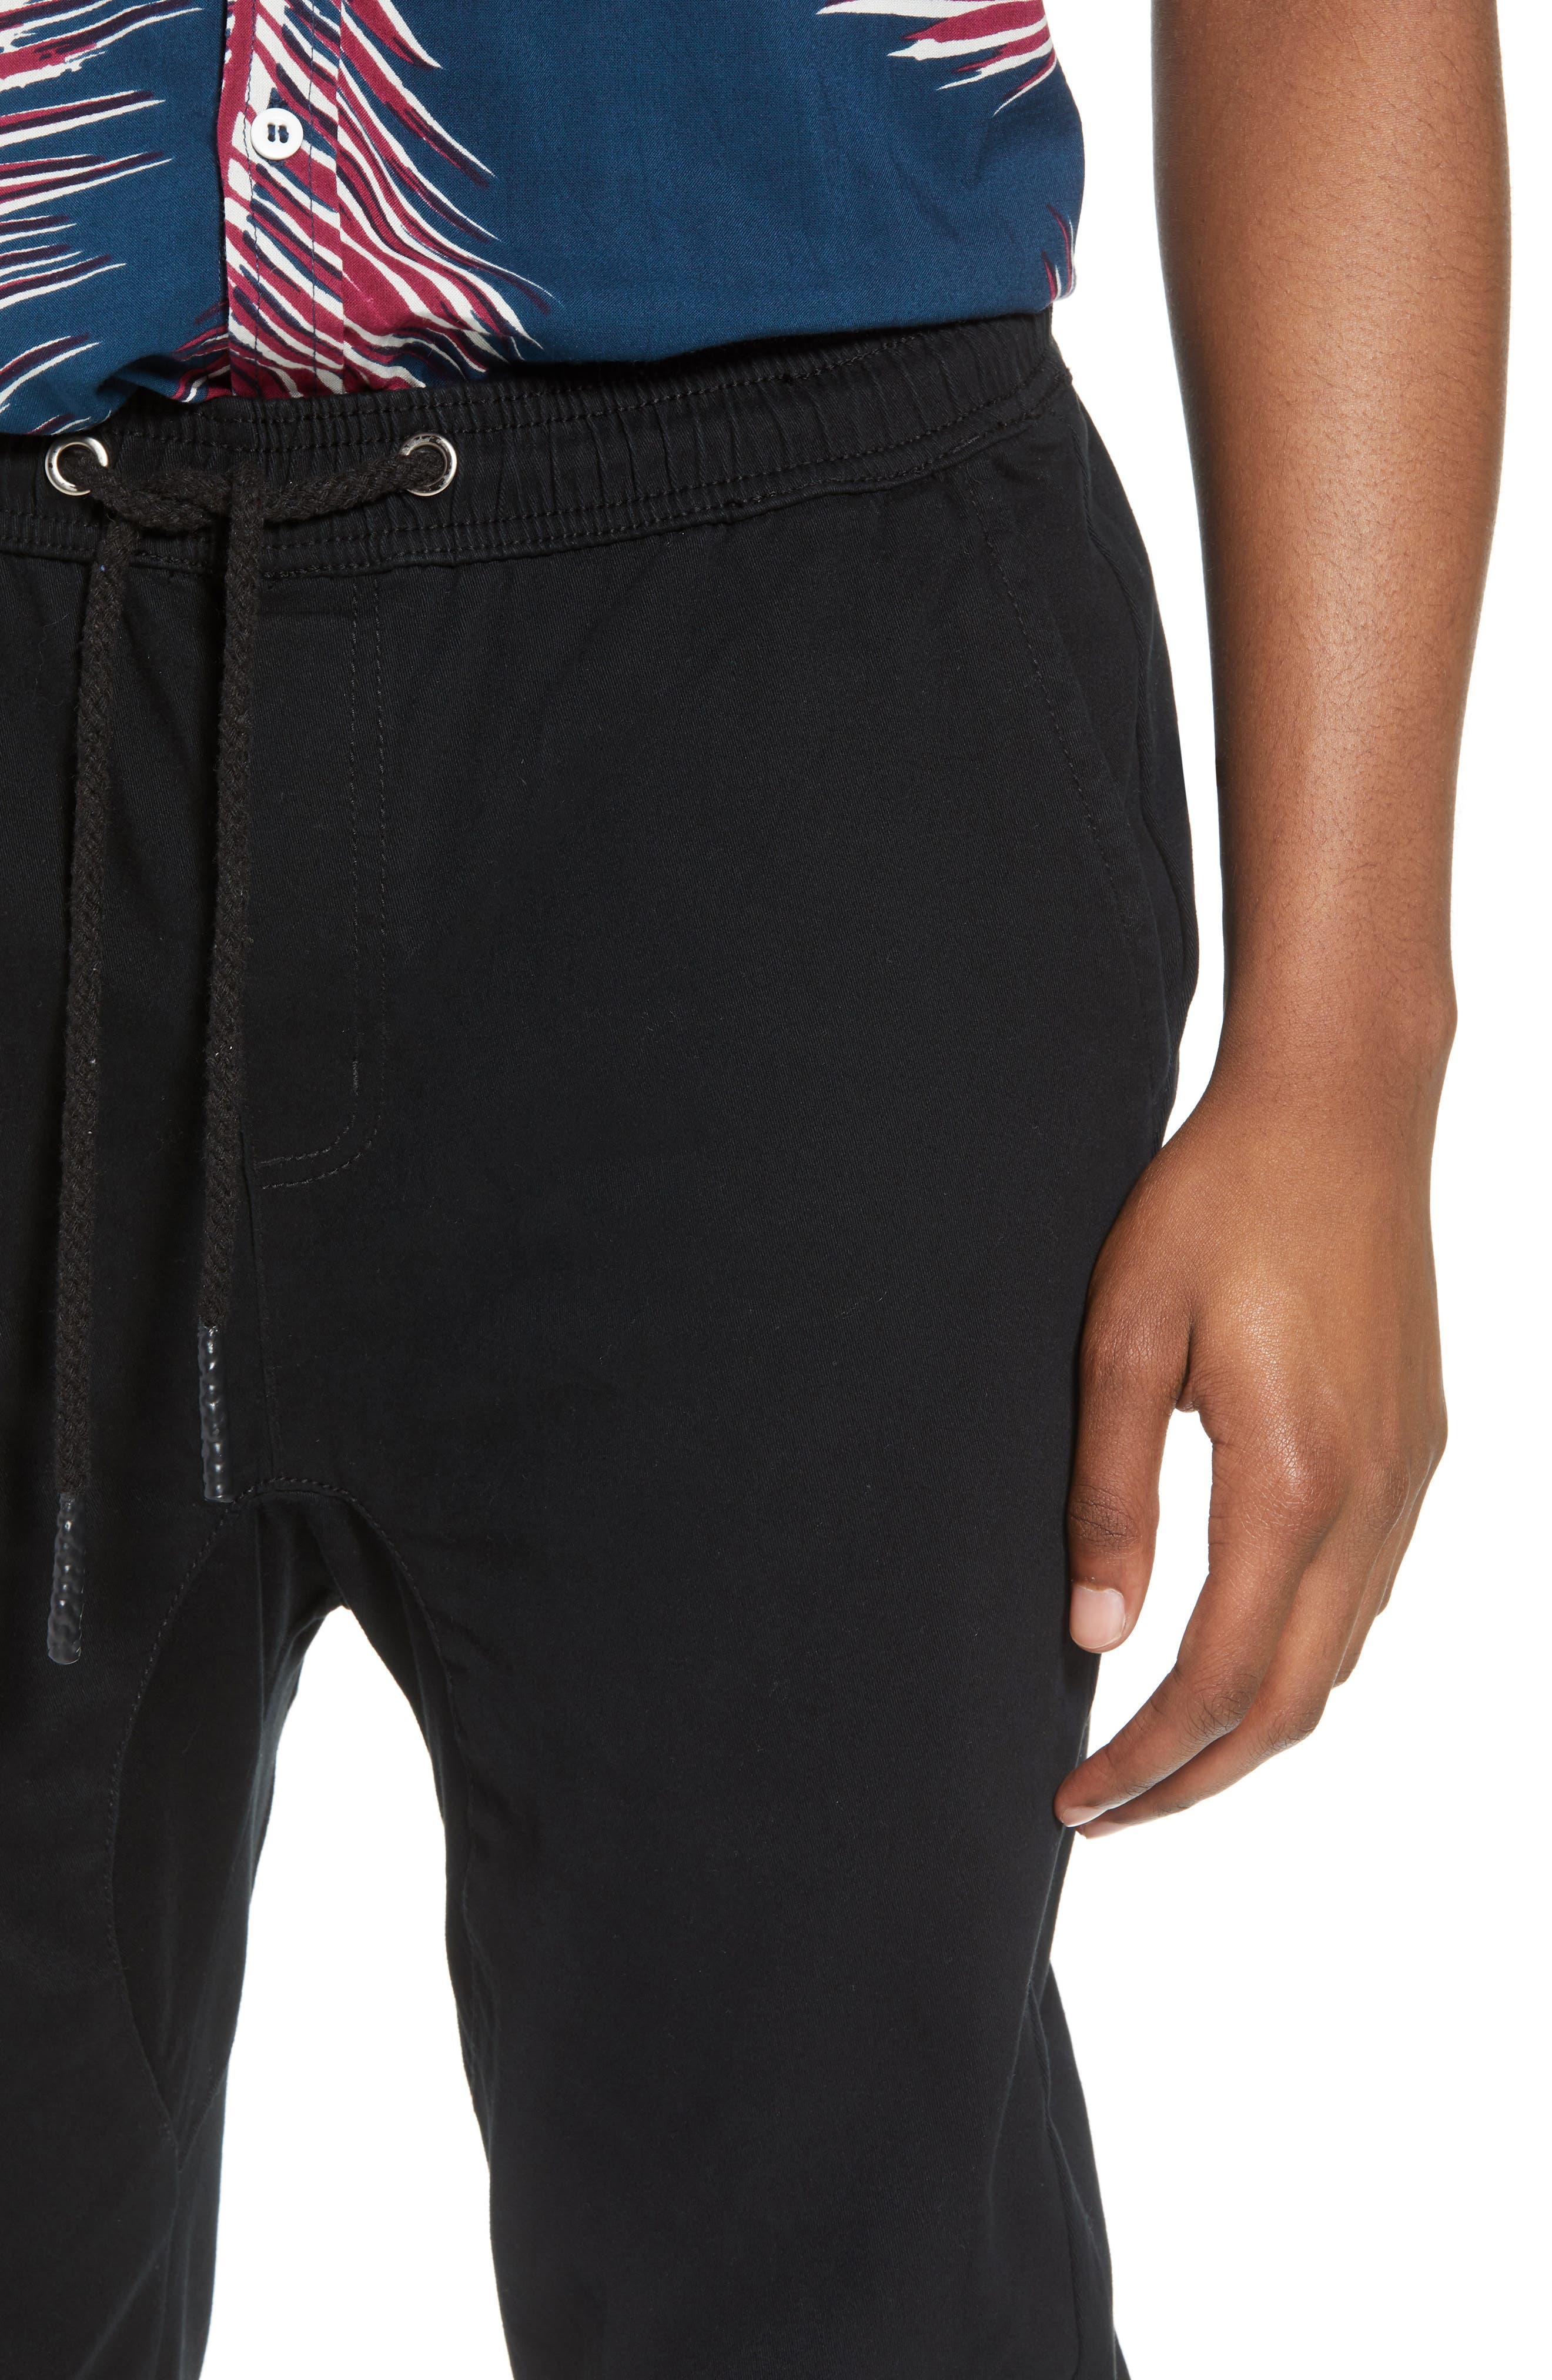 Vacation Slim Fit Crop Pants,                             Alternate thumbnail 4, color,                             BLACK